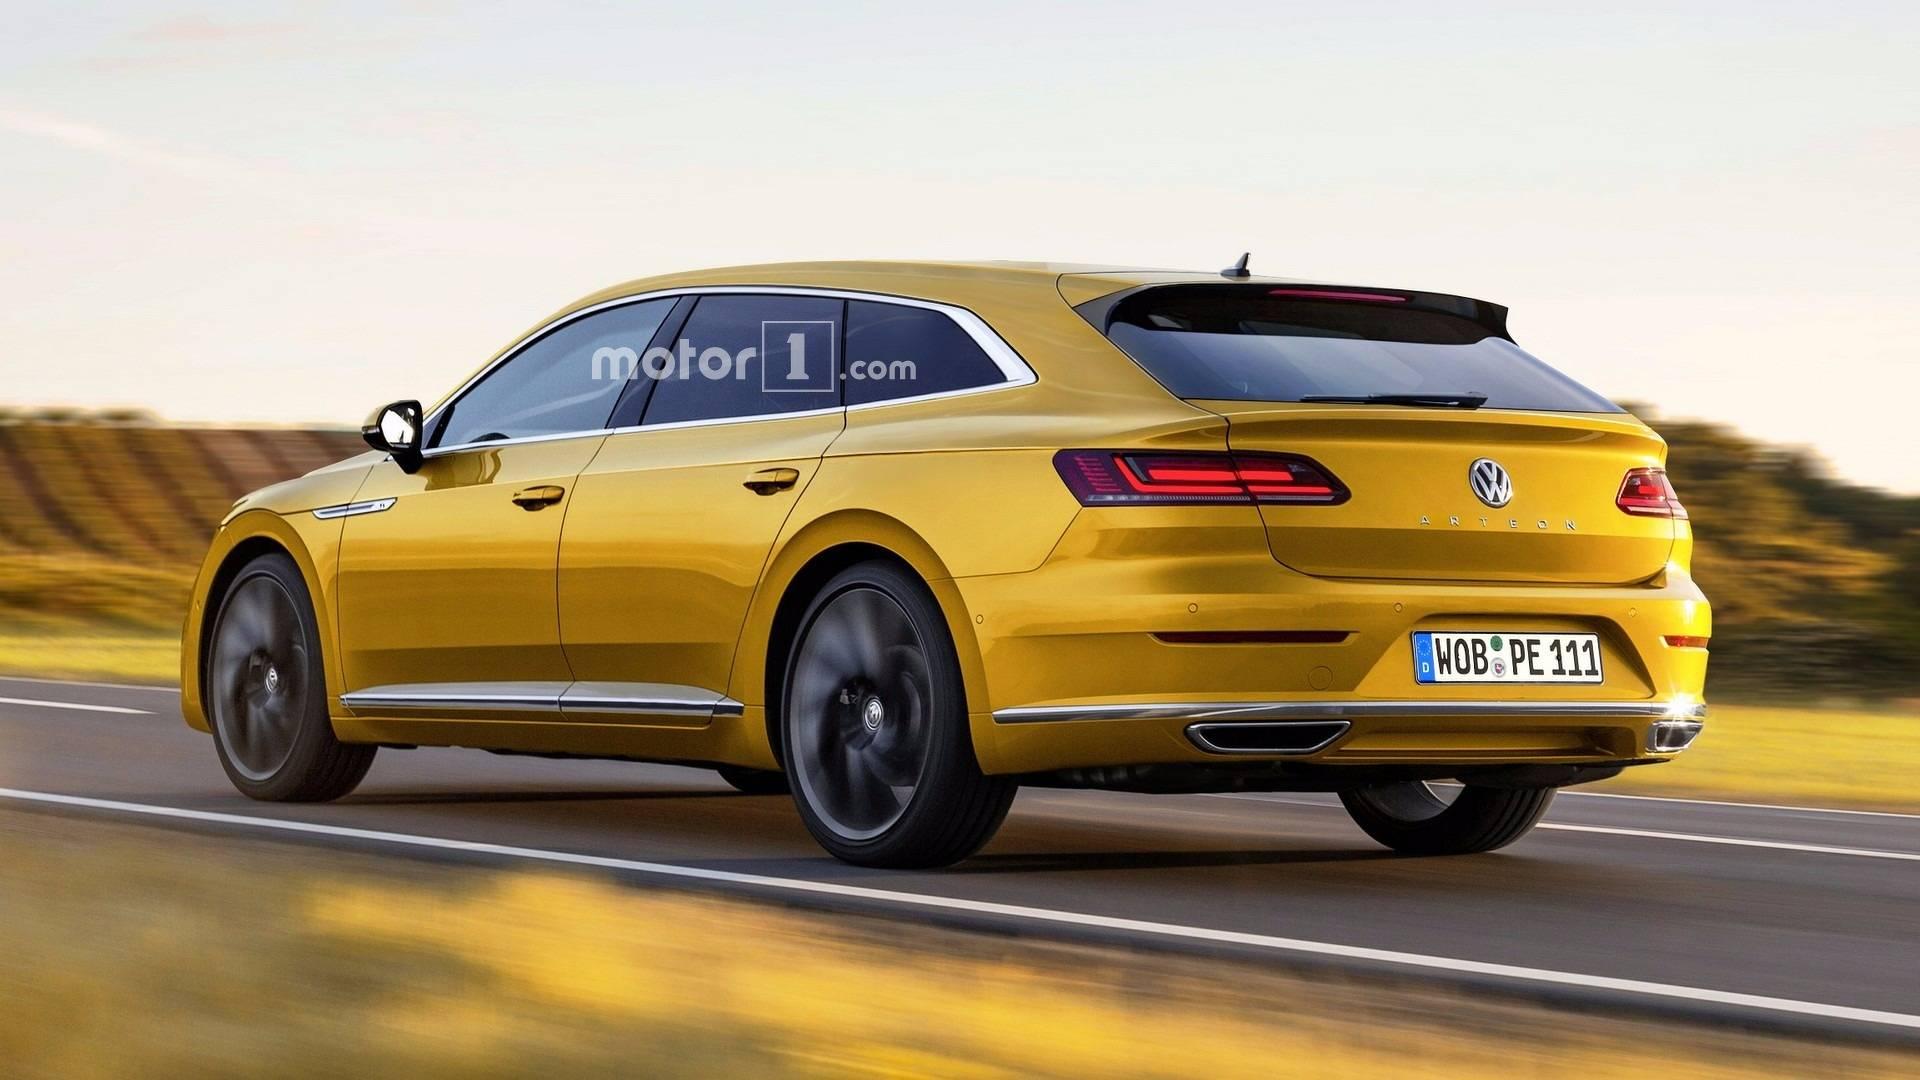 VW Arteon Usa >> Vw Shooting Brake Announced Is It Based On The Arteon